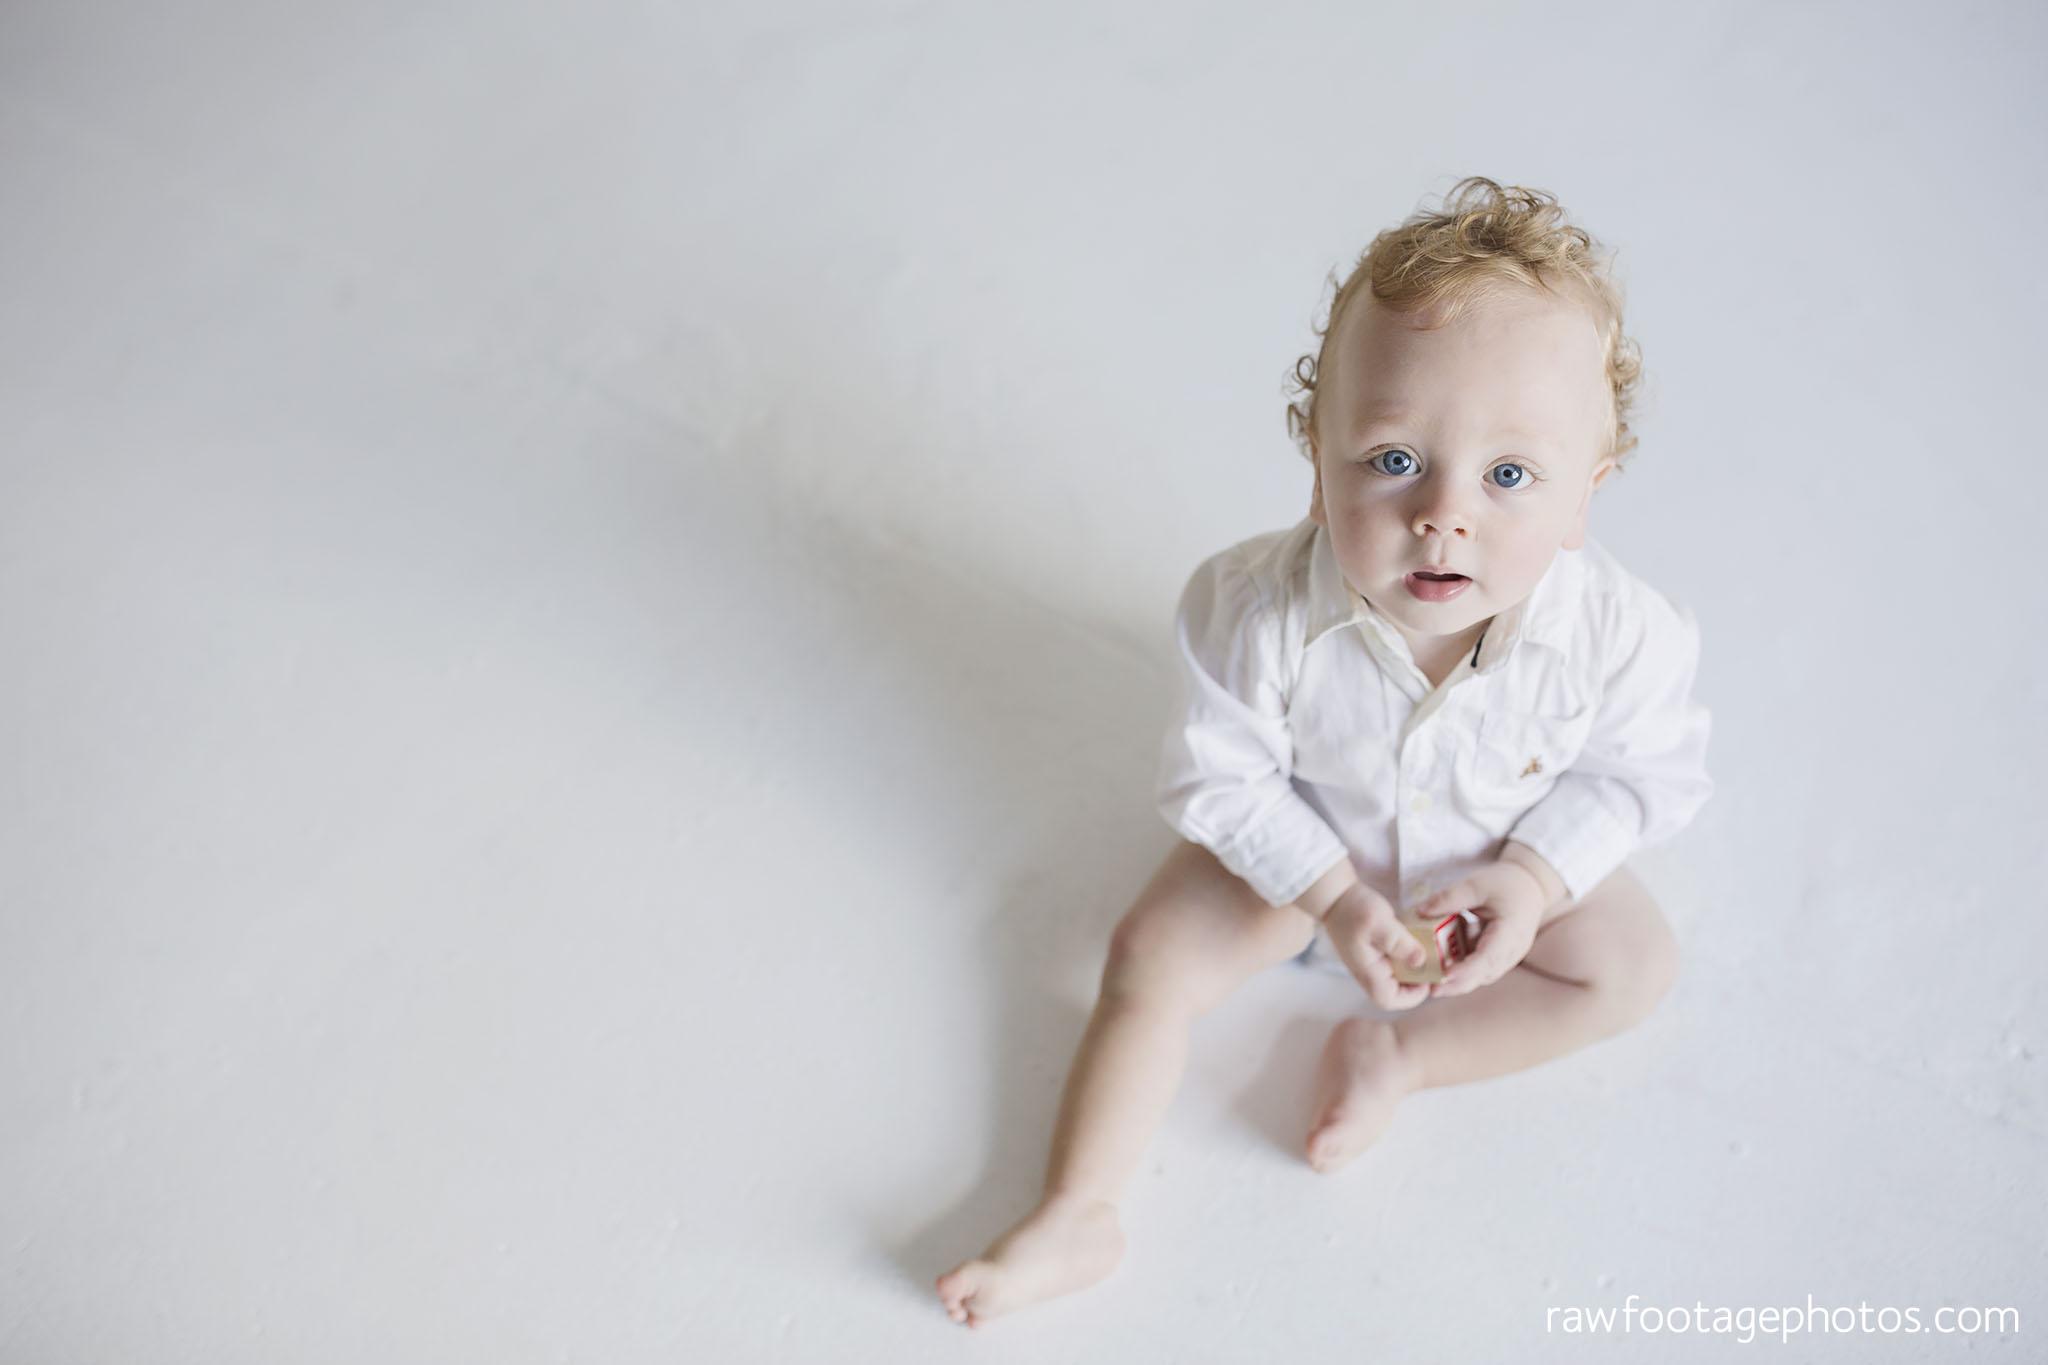 london_ontario_family_photographer-studio_photography-studio_lifestyle_portraits-white_studio-mother_son-candid_family_photography-raw_footage_photography023.jpg